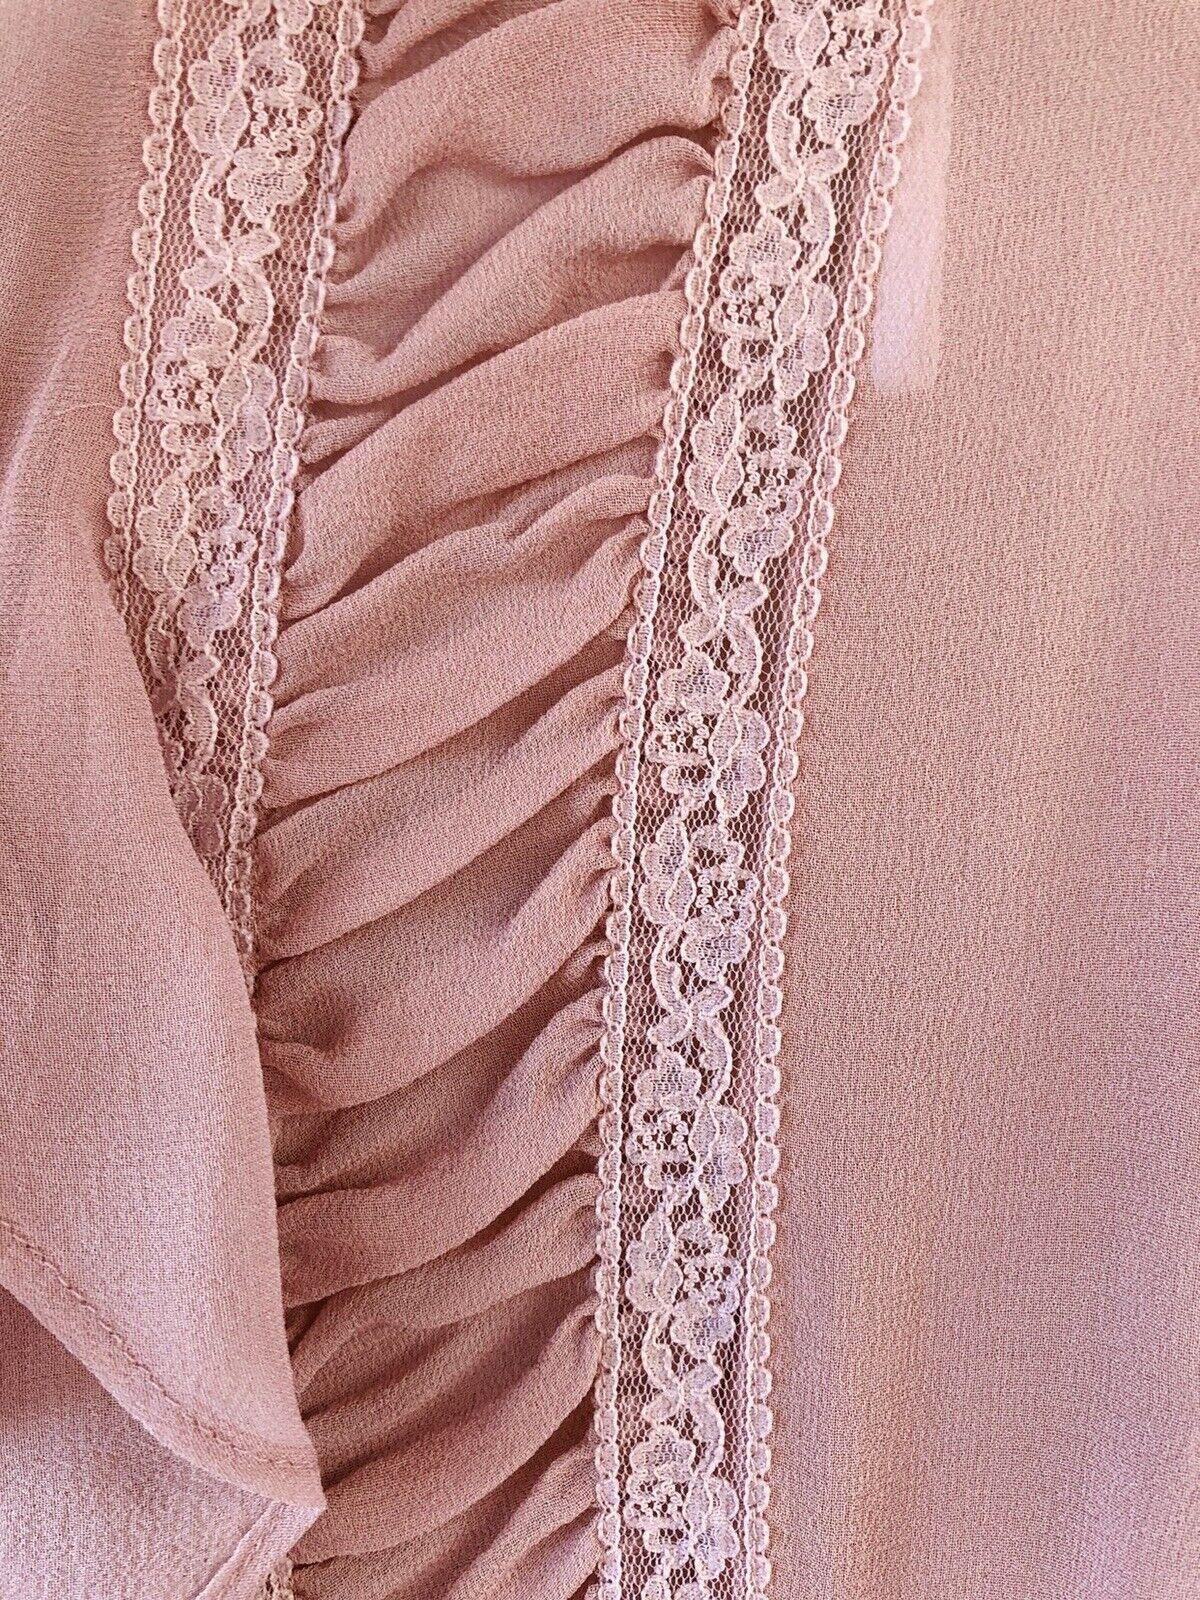 Vintage Stunning Jones Wear Silk Sheer Dusty Lila… - image 5